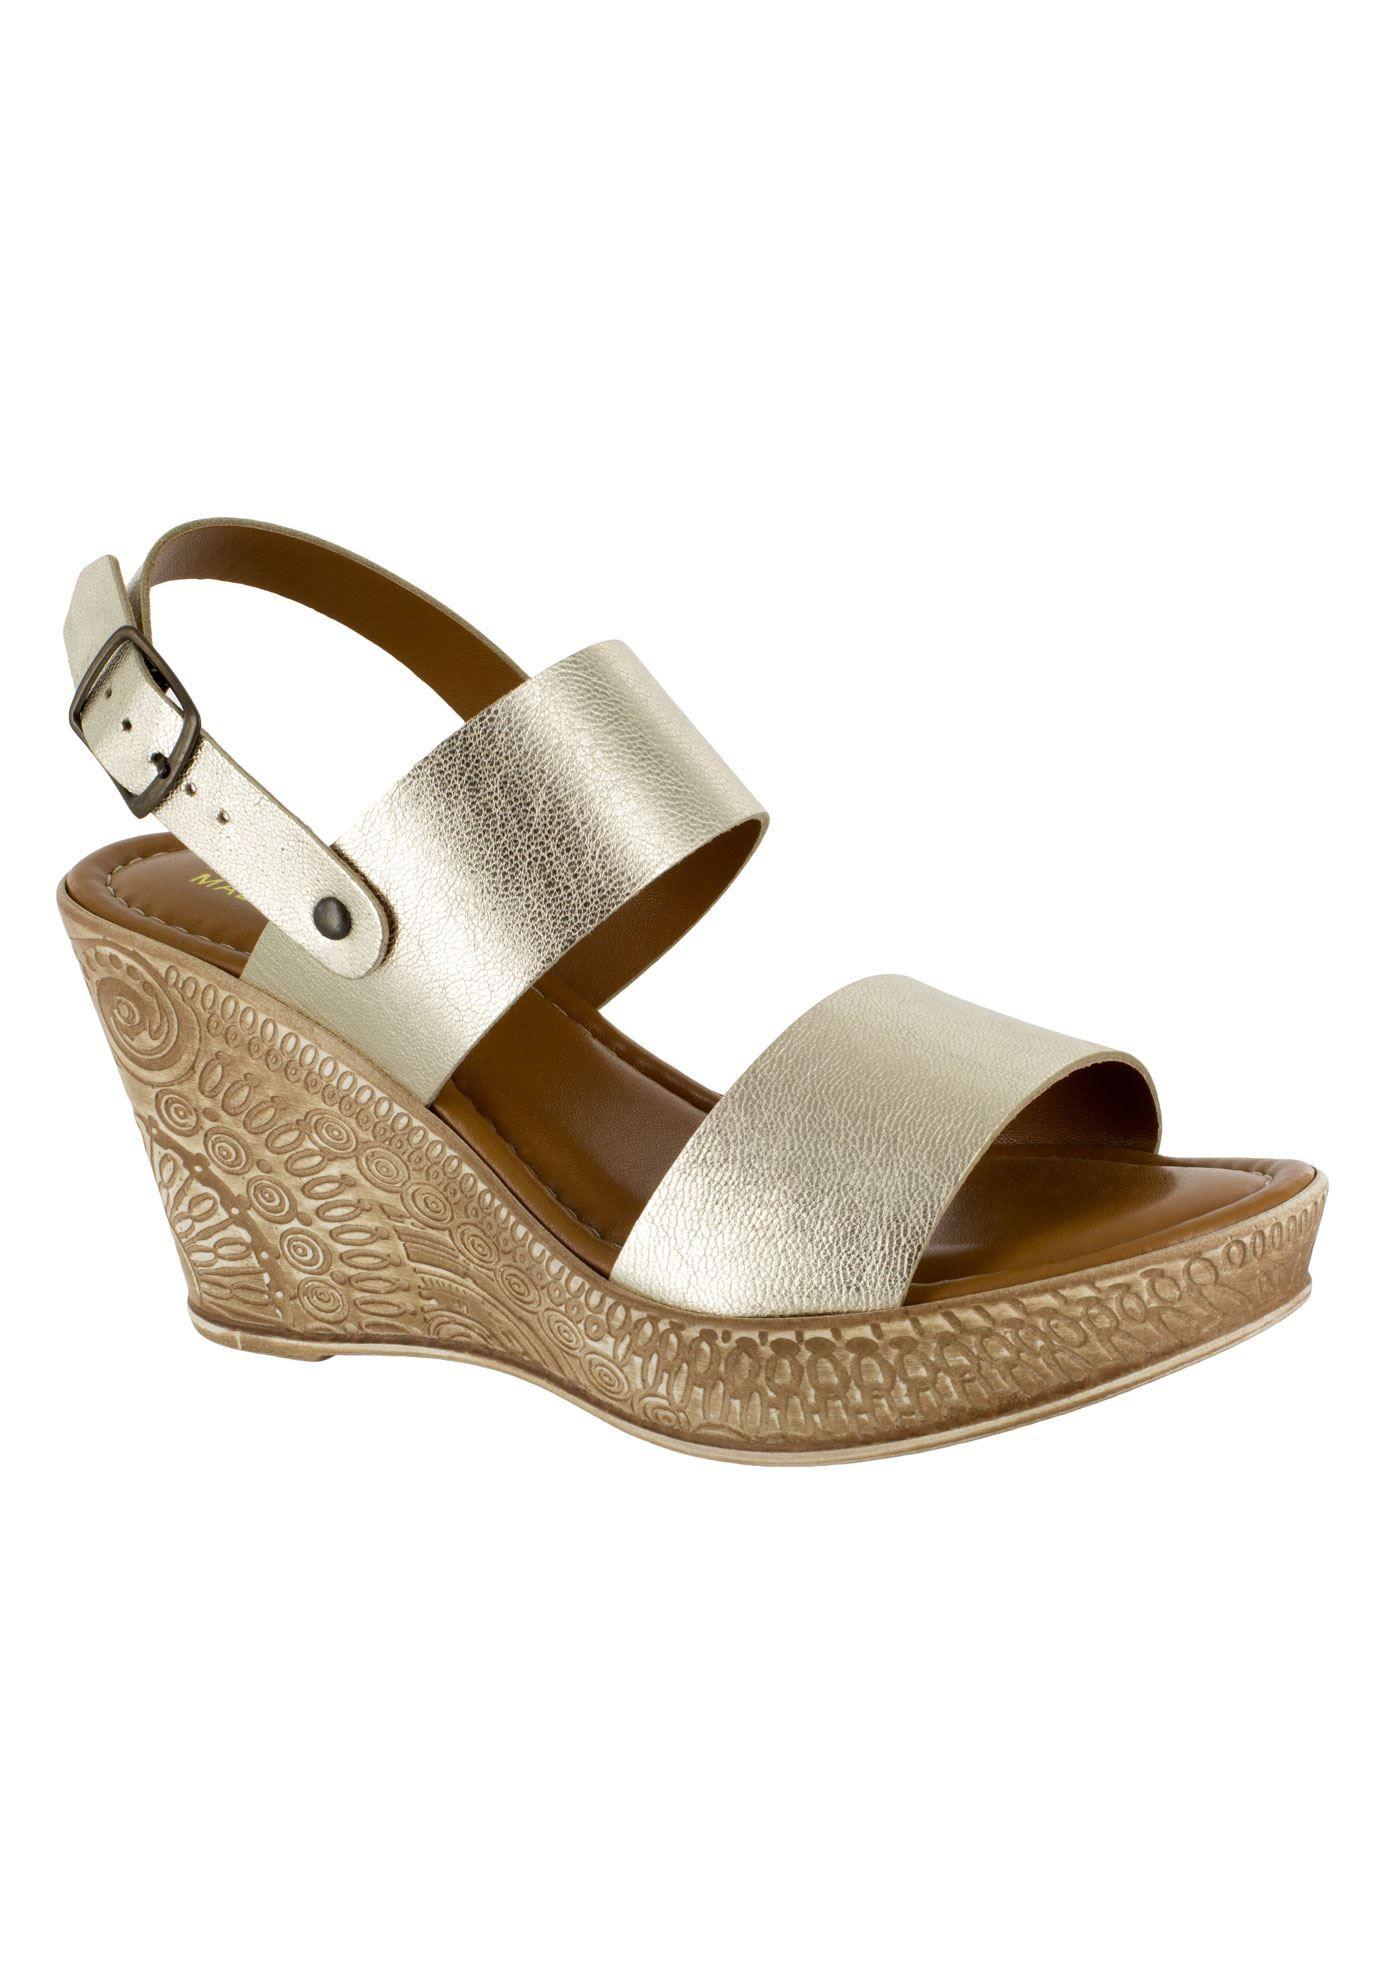 e096fe38f5b70 Cor-Italy Sandals by Bella Vita - Wide Width Women's | Products